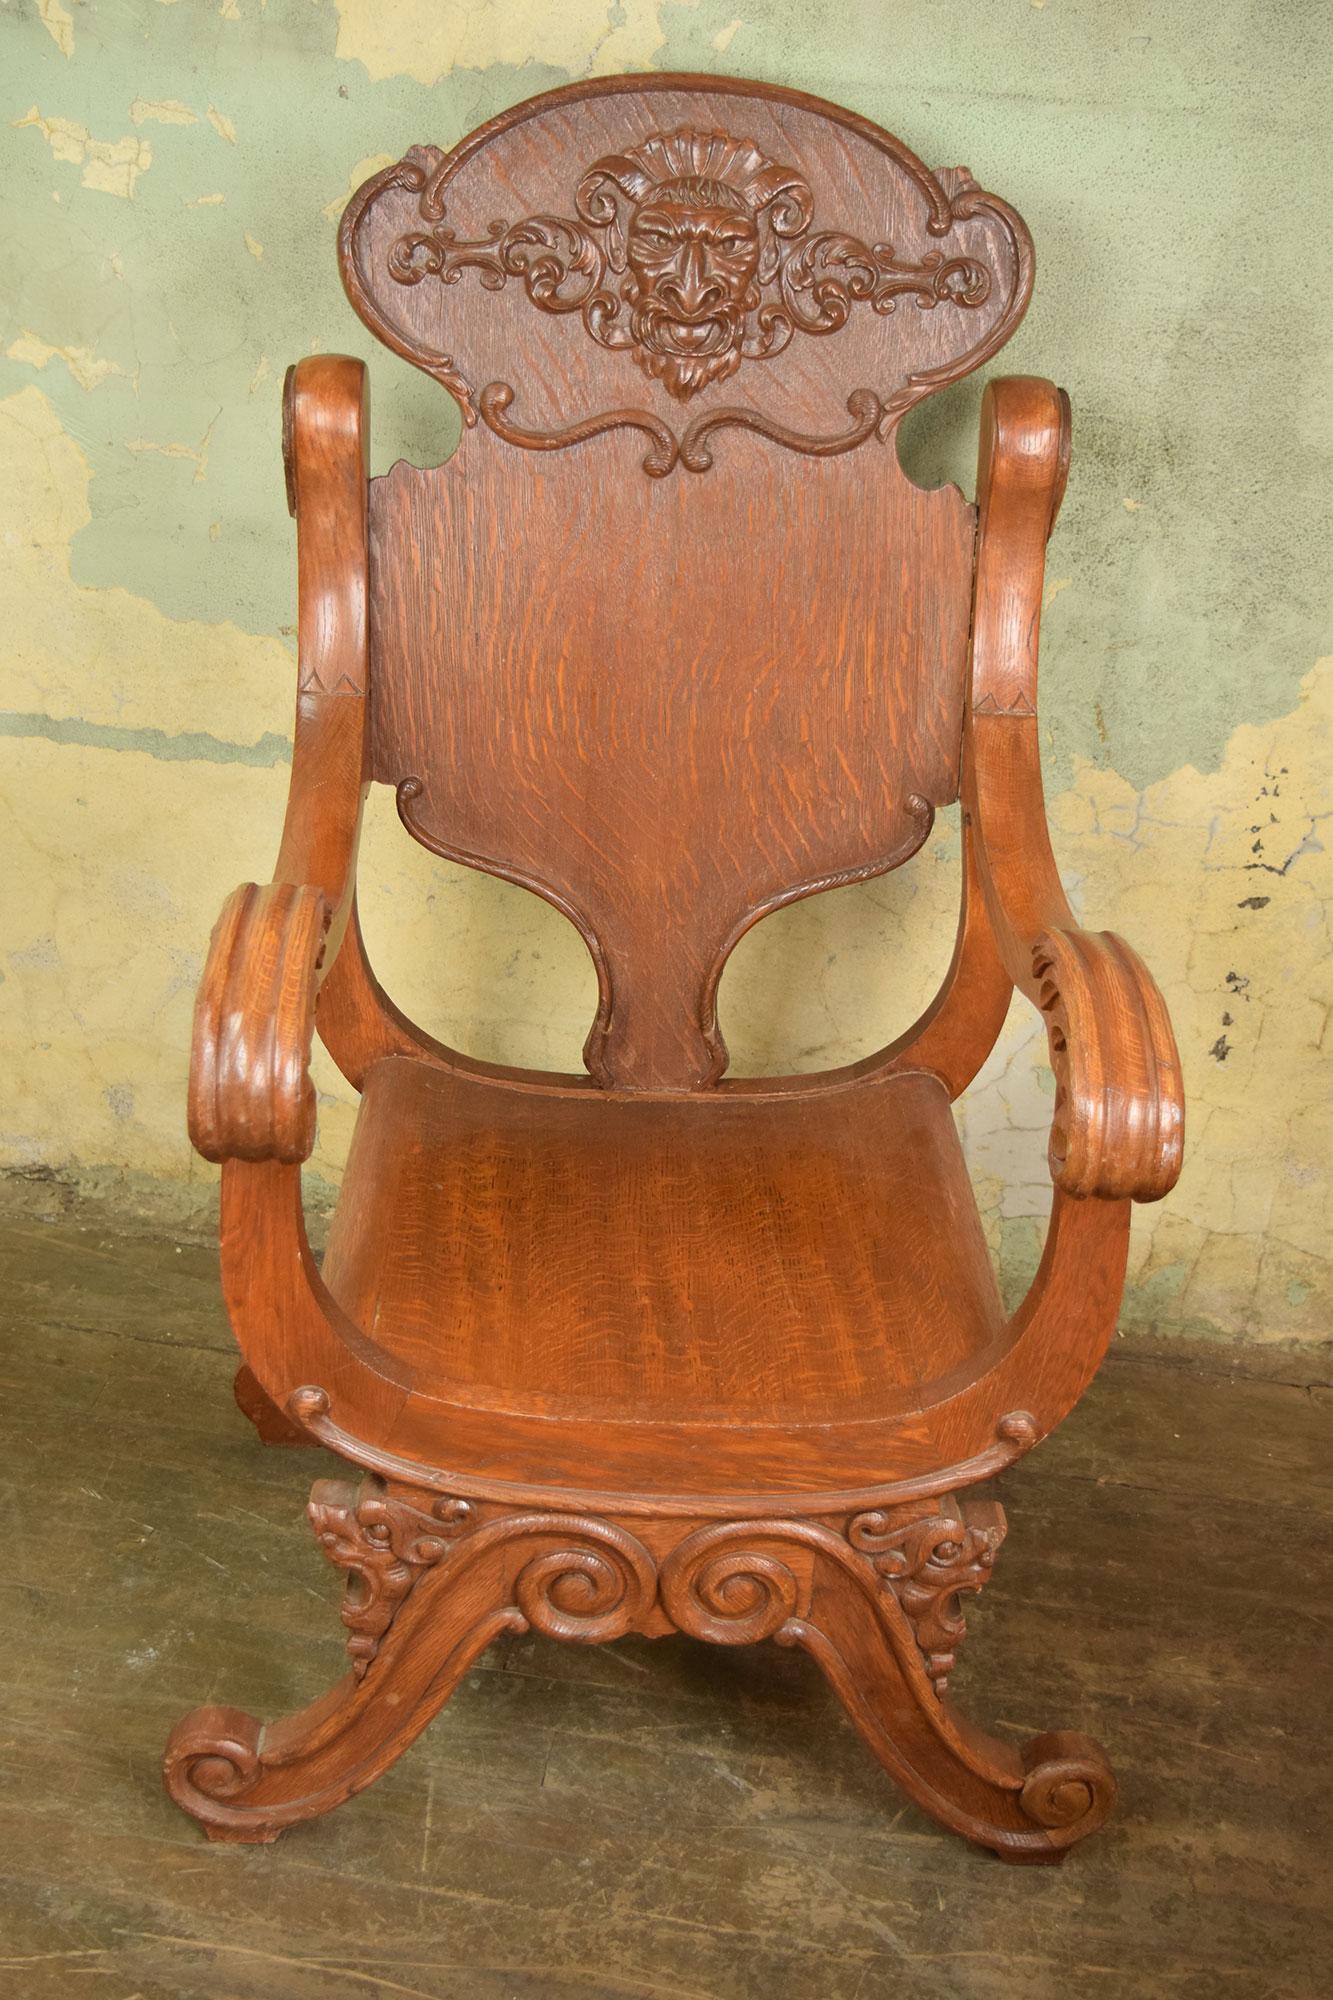 46897-arm-chair-with-zeus-face-whole.jpg